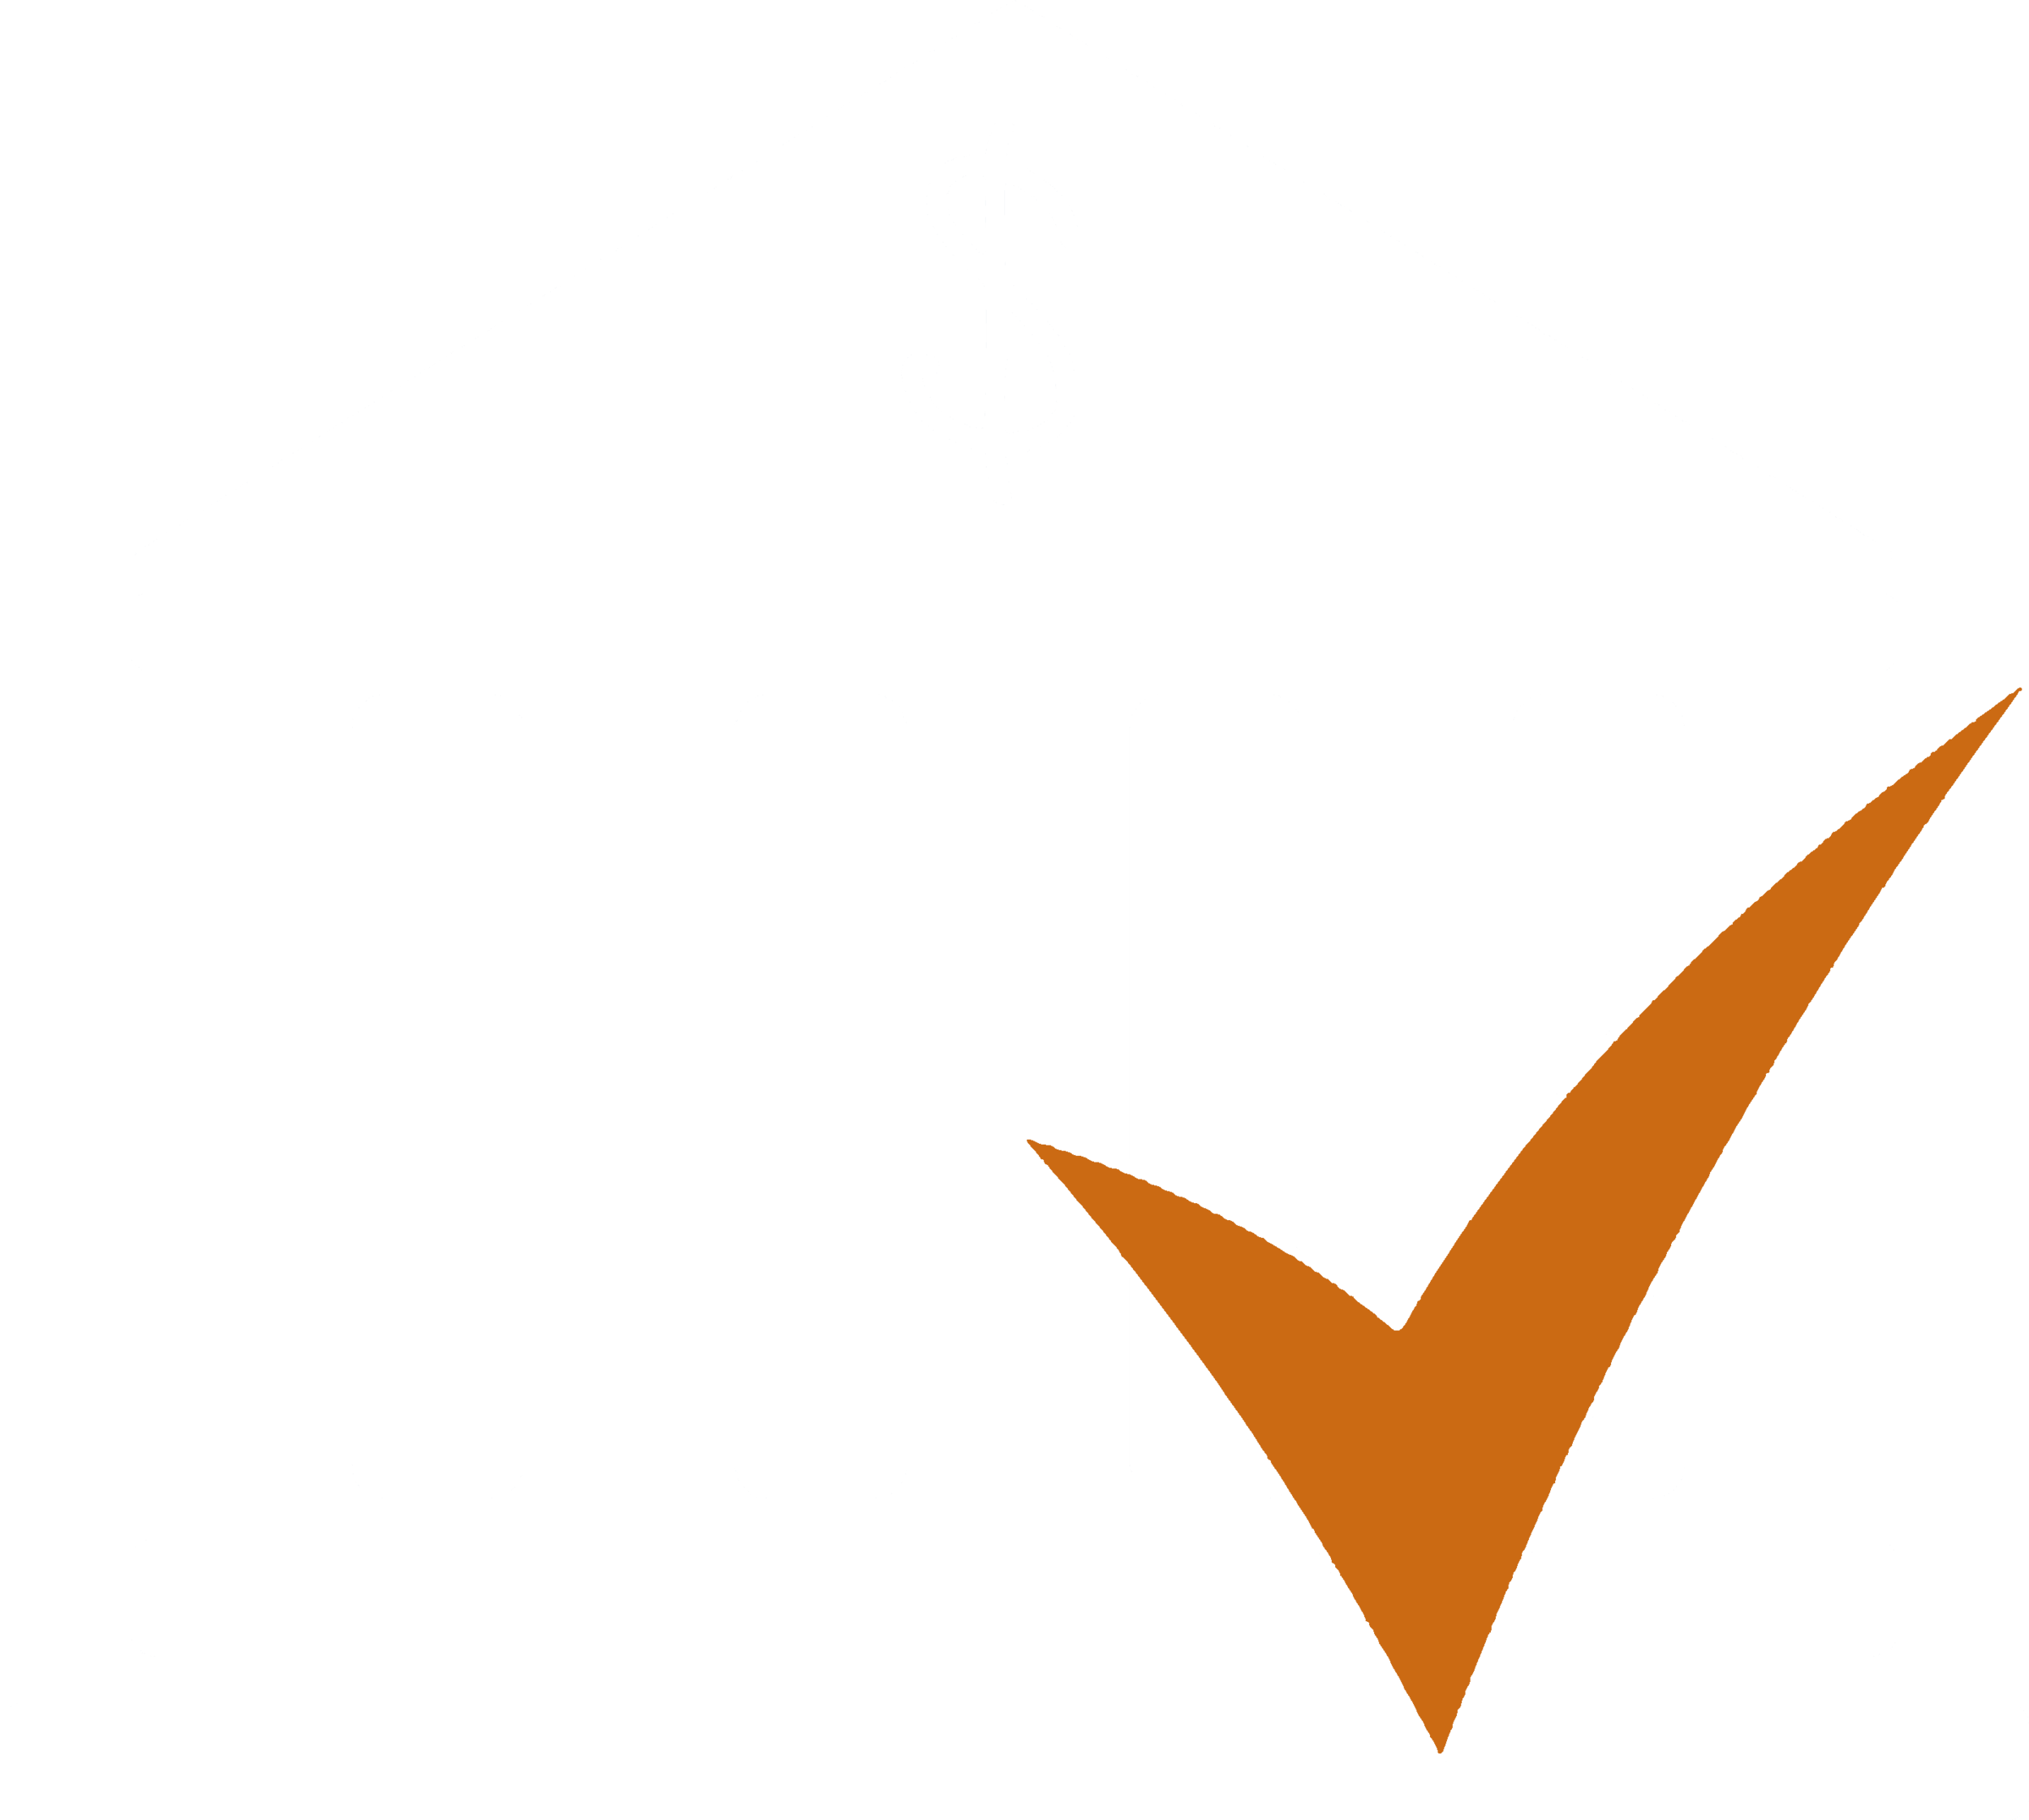 conciliacion_bancos_blanco_naranja.png